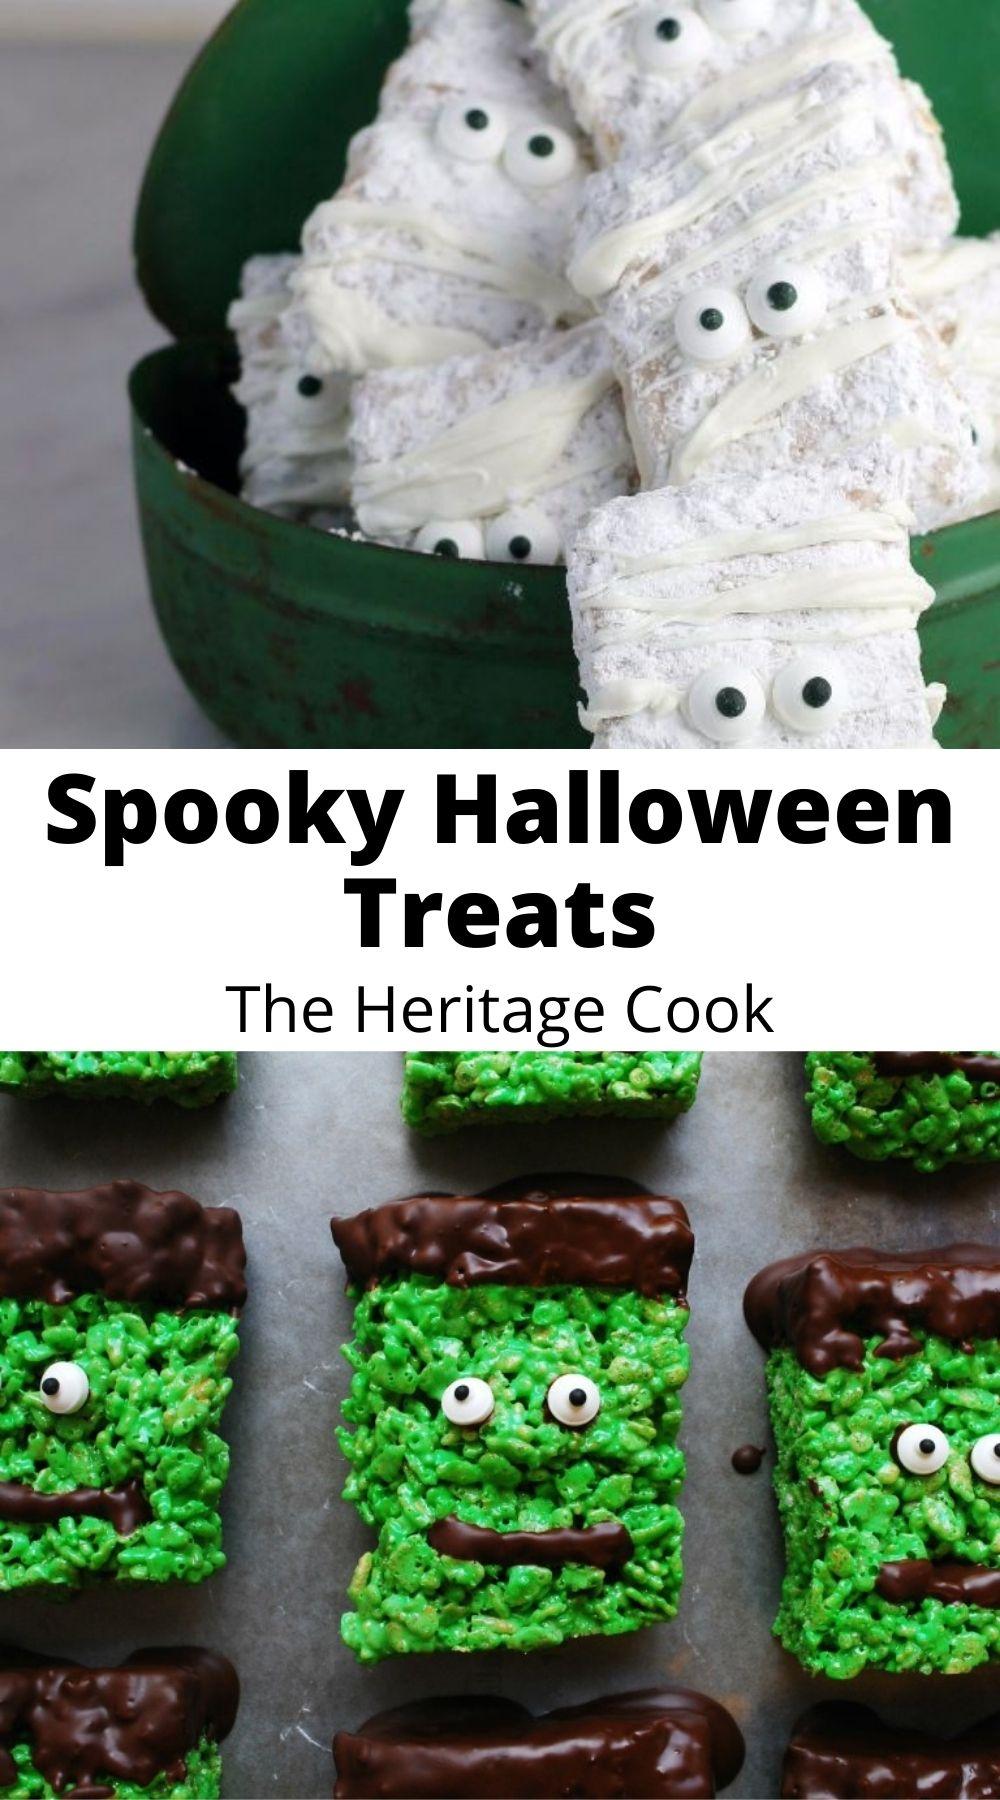 Spooky Halloween Treats collection; Jane Bonacci, The Heritage Cook 2017